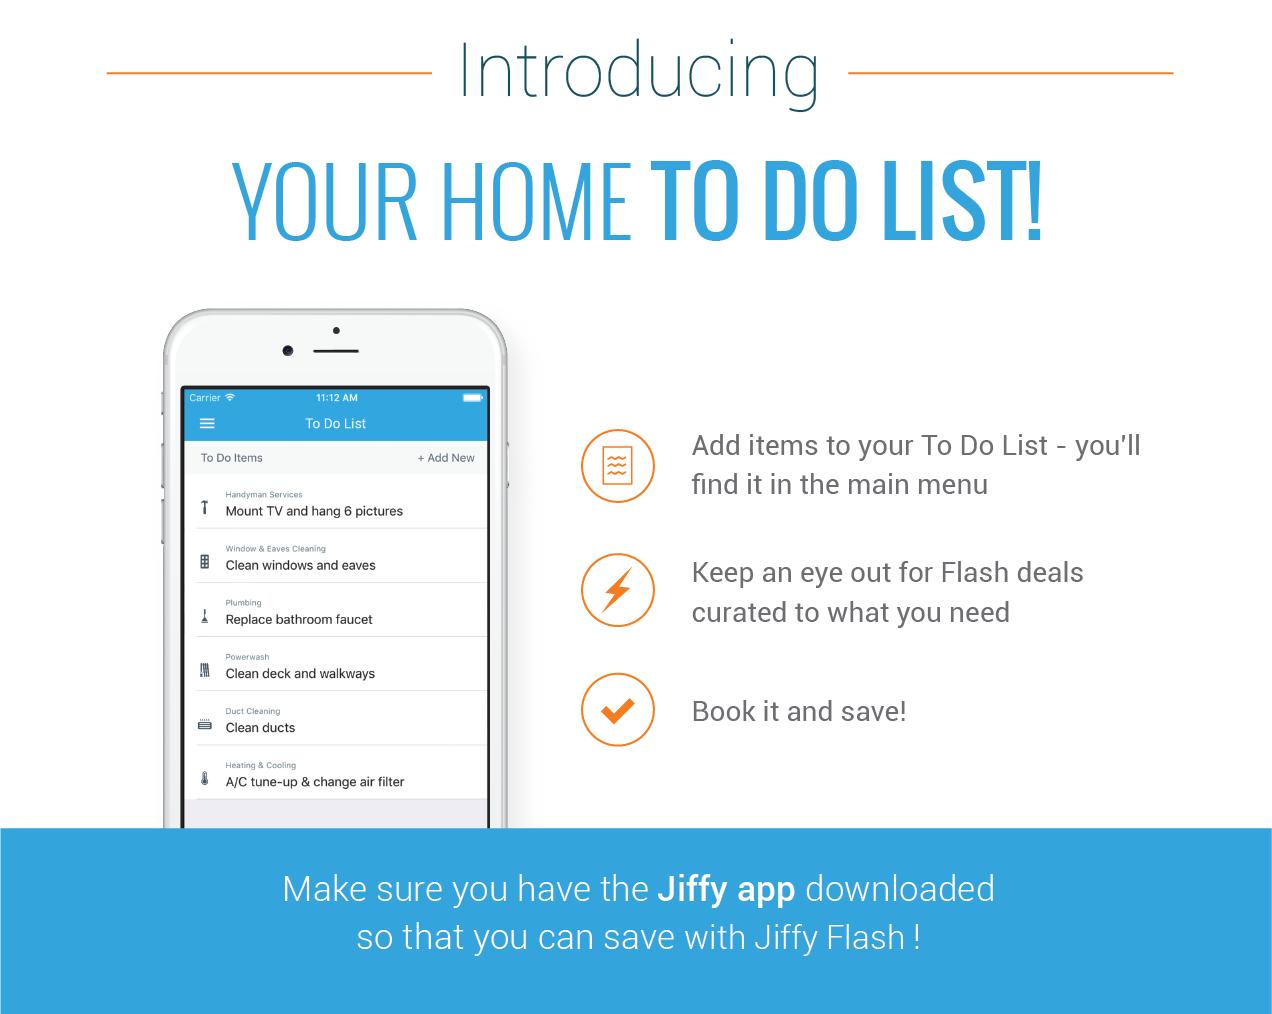 jiffy to do lists keep your home maintenance organized save